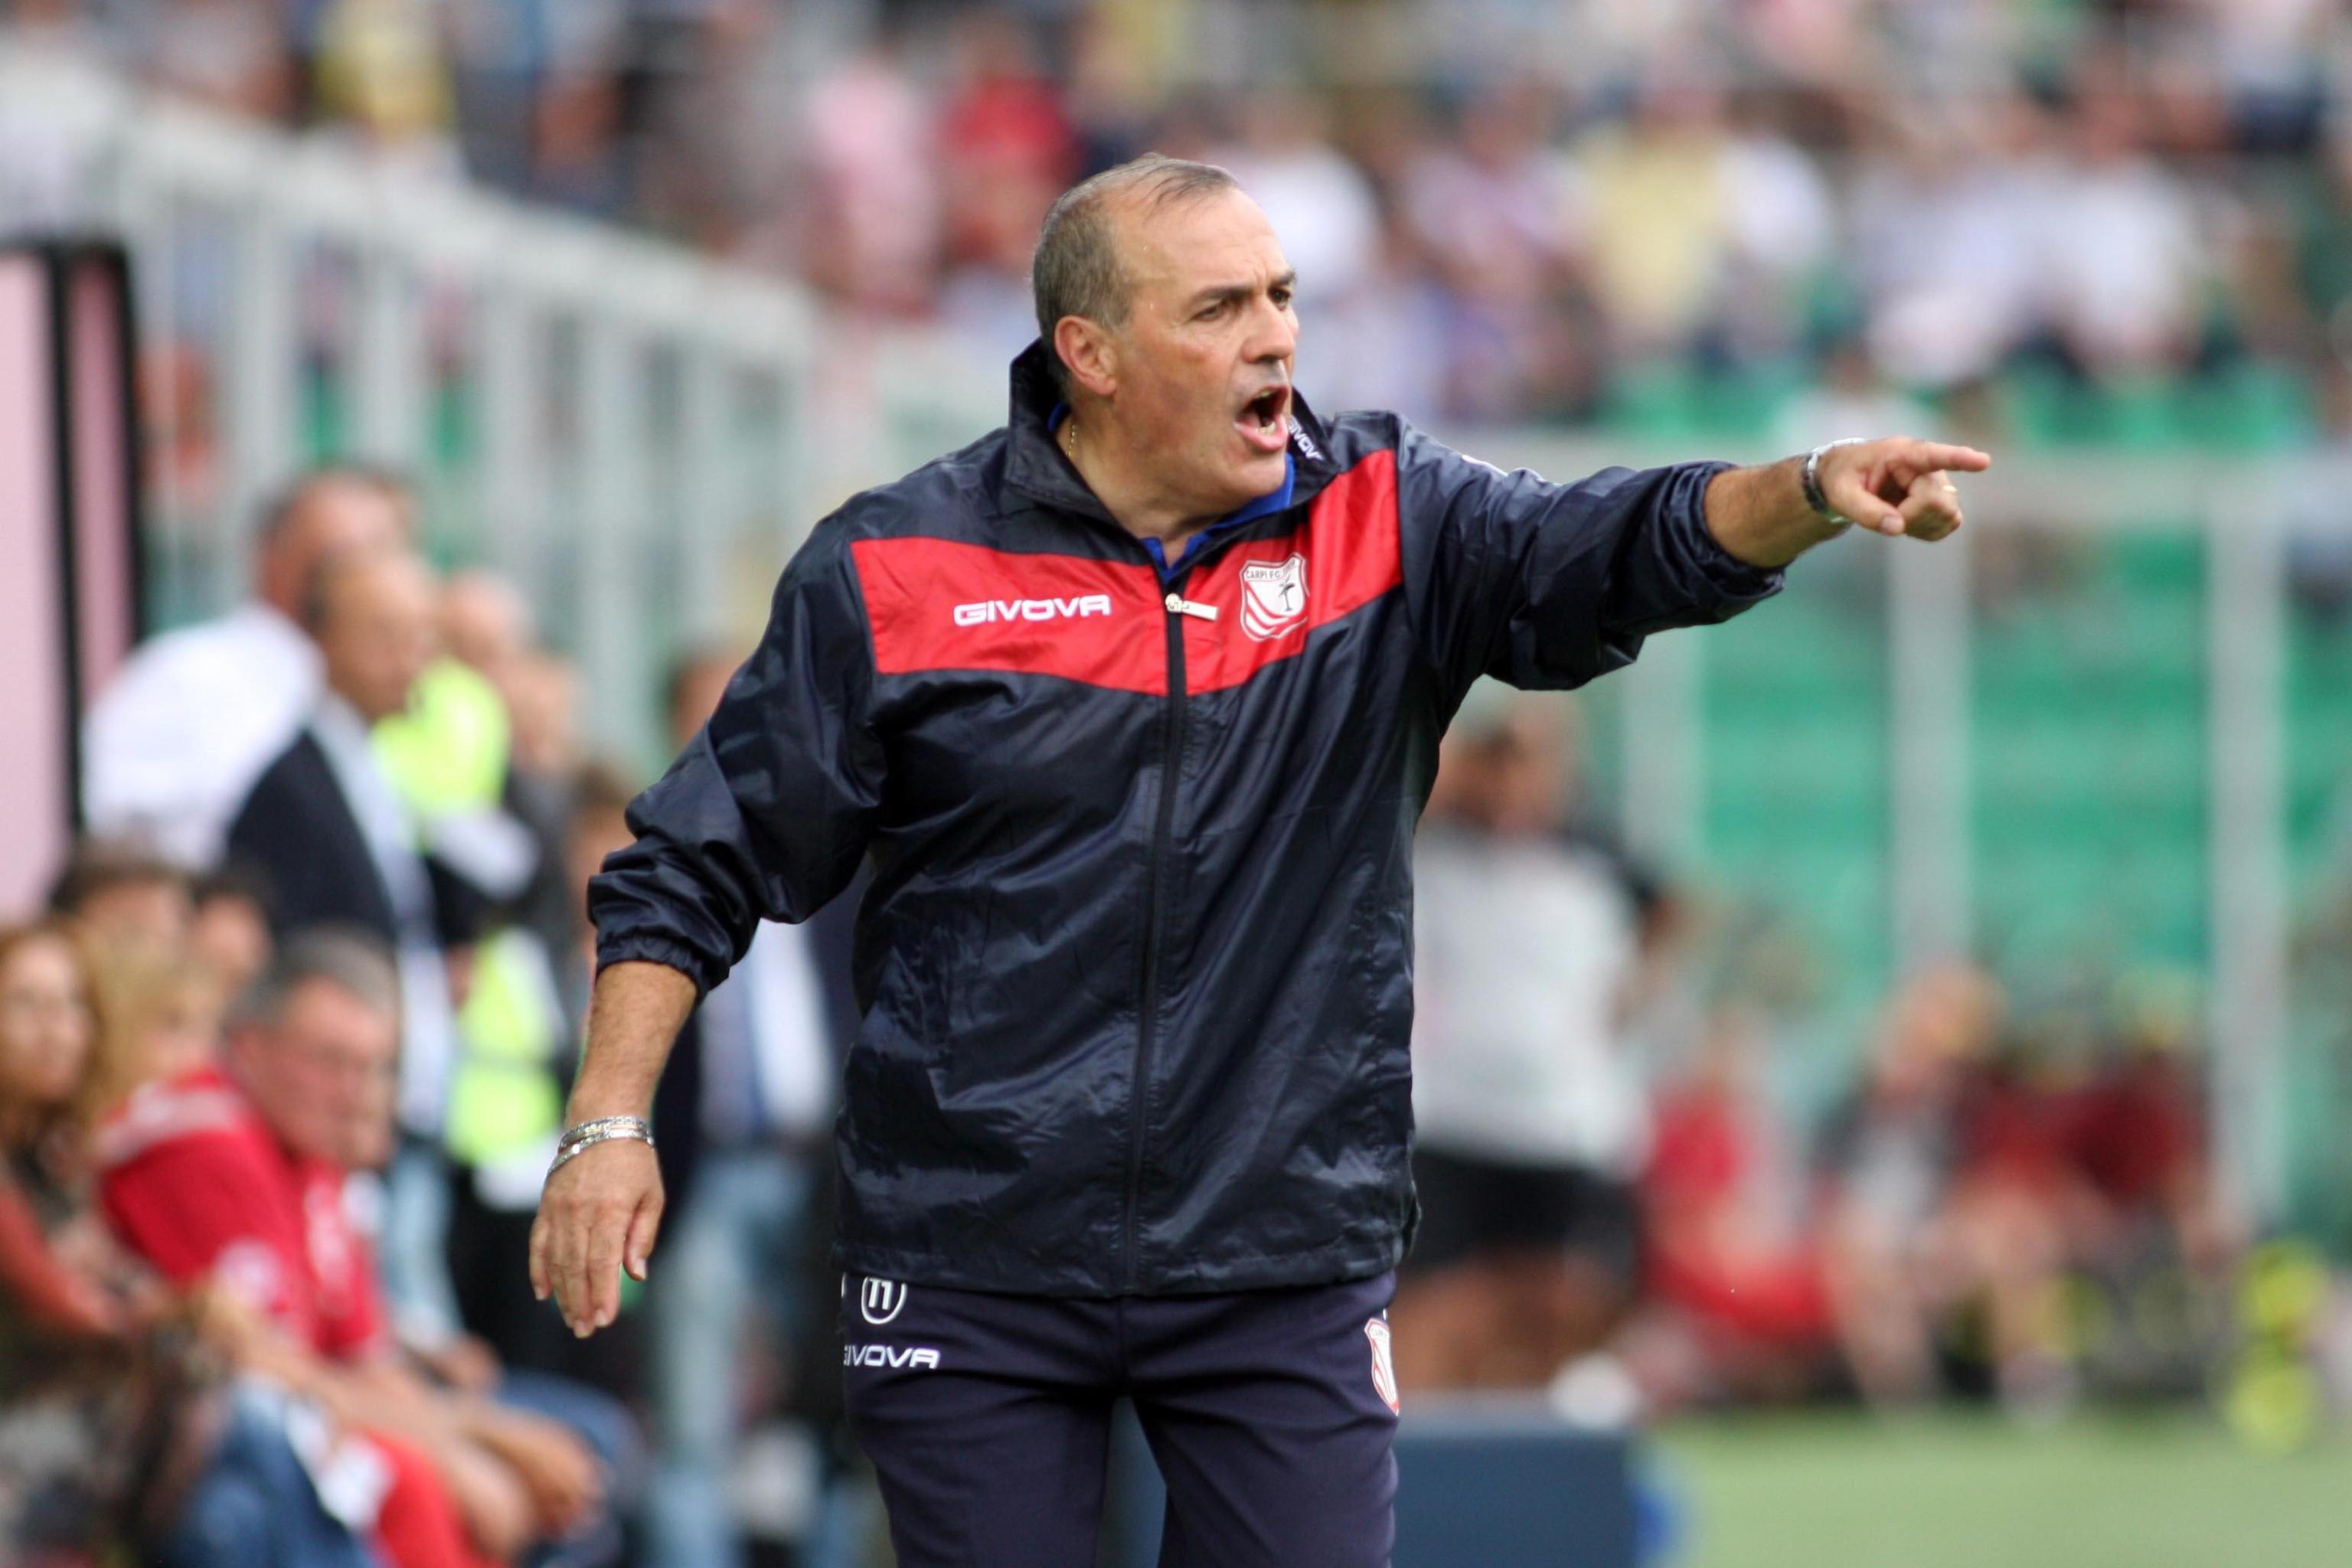 Soccer: Serie A; Palermo-Carpi